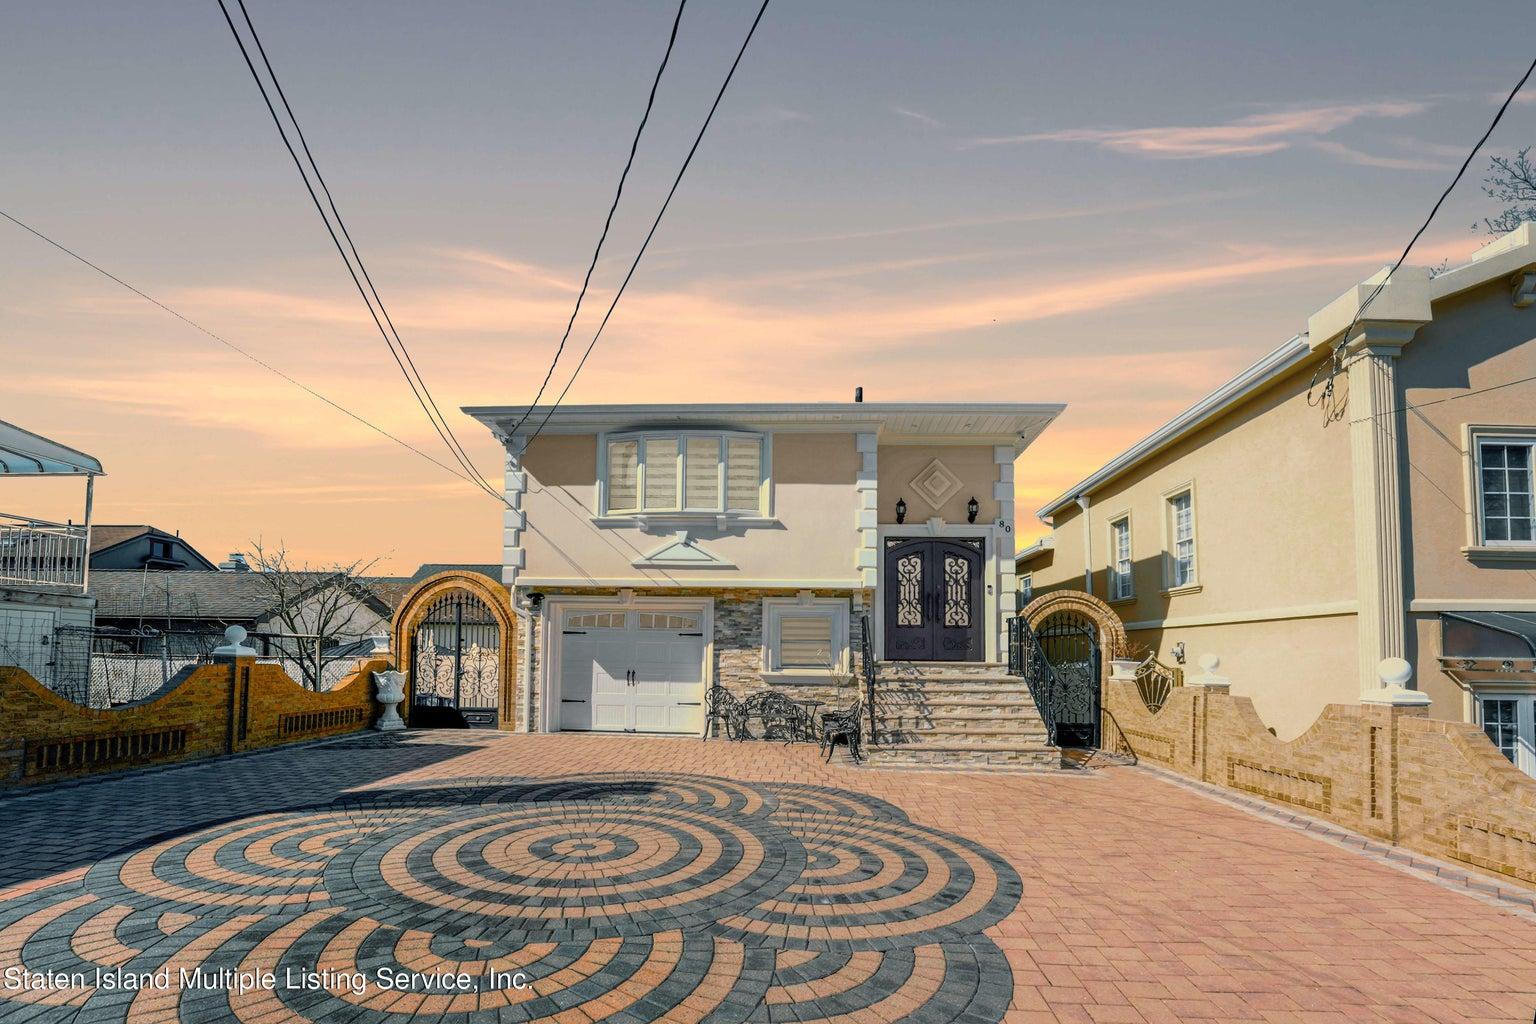 80 Sand Lane: Welcome Home, 80 Sand Lane in Arrochar, Staten Island